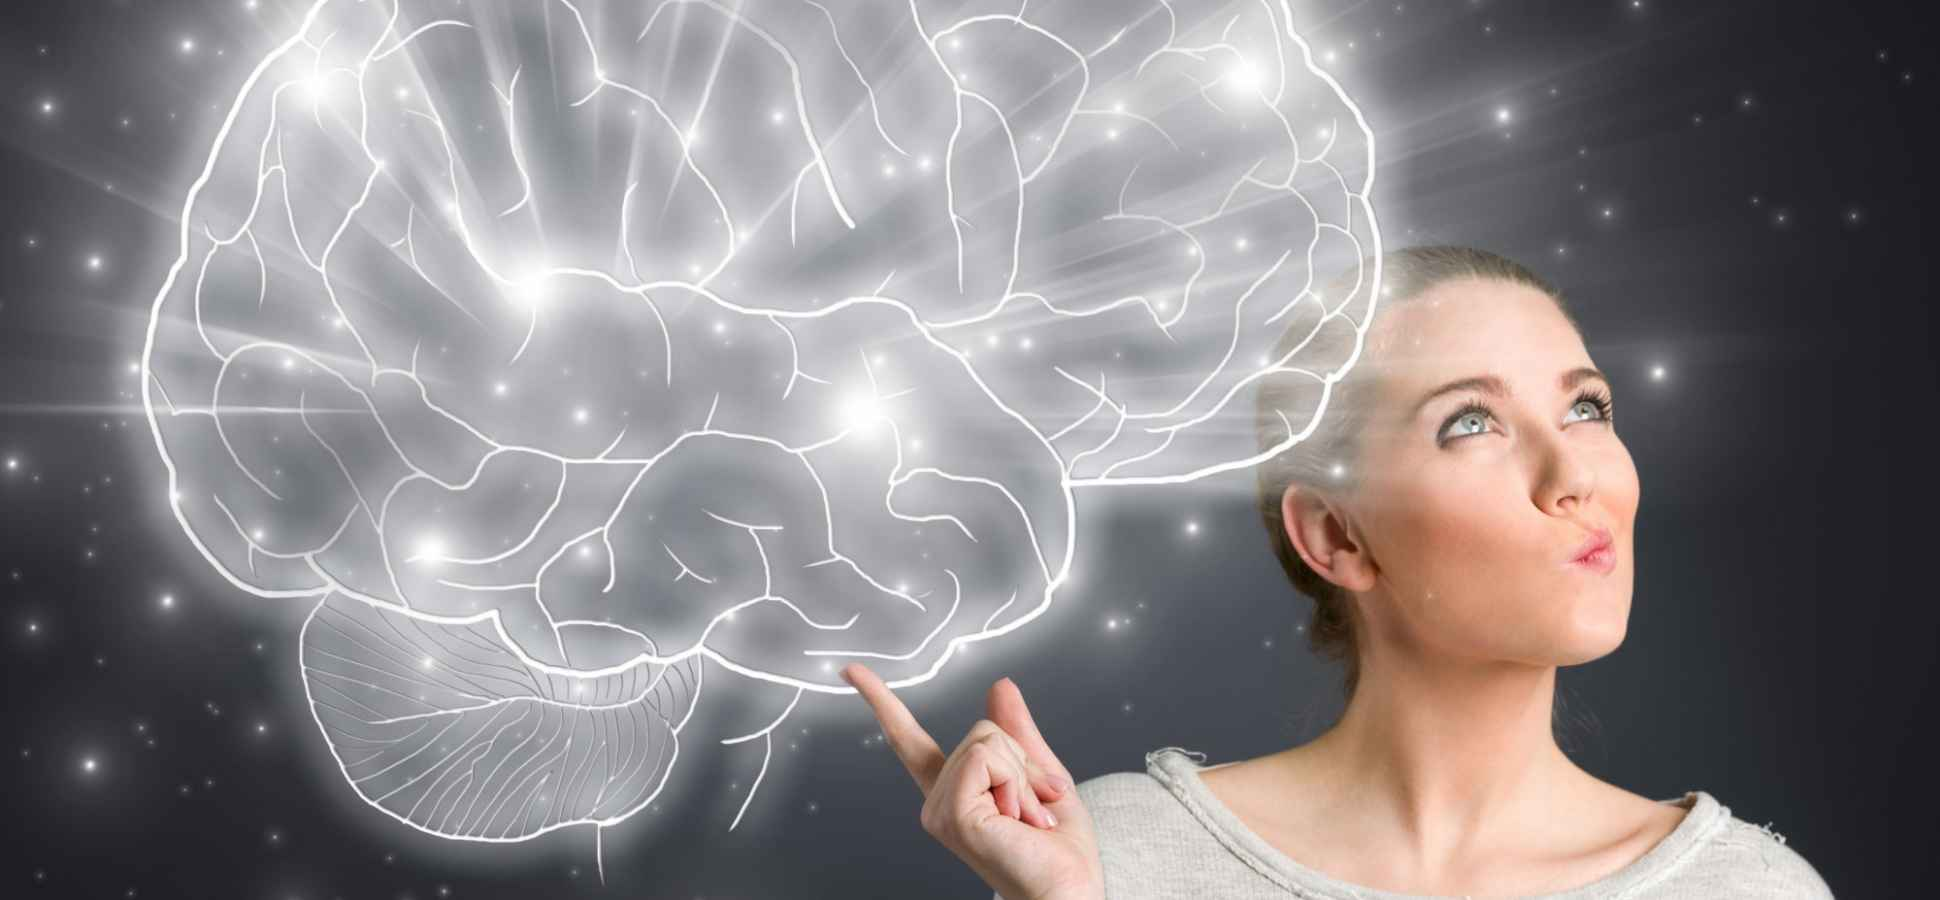 4 Ways to Retrain Your Brain to Be Smarter, Happier, and Healthier